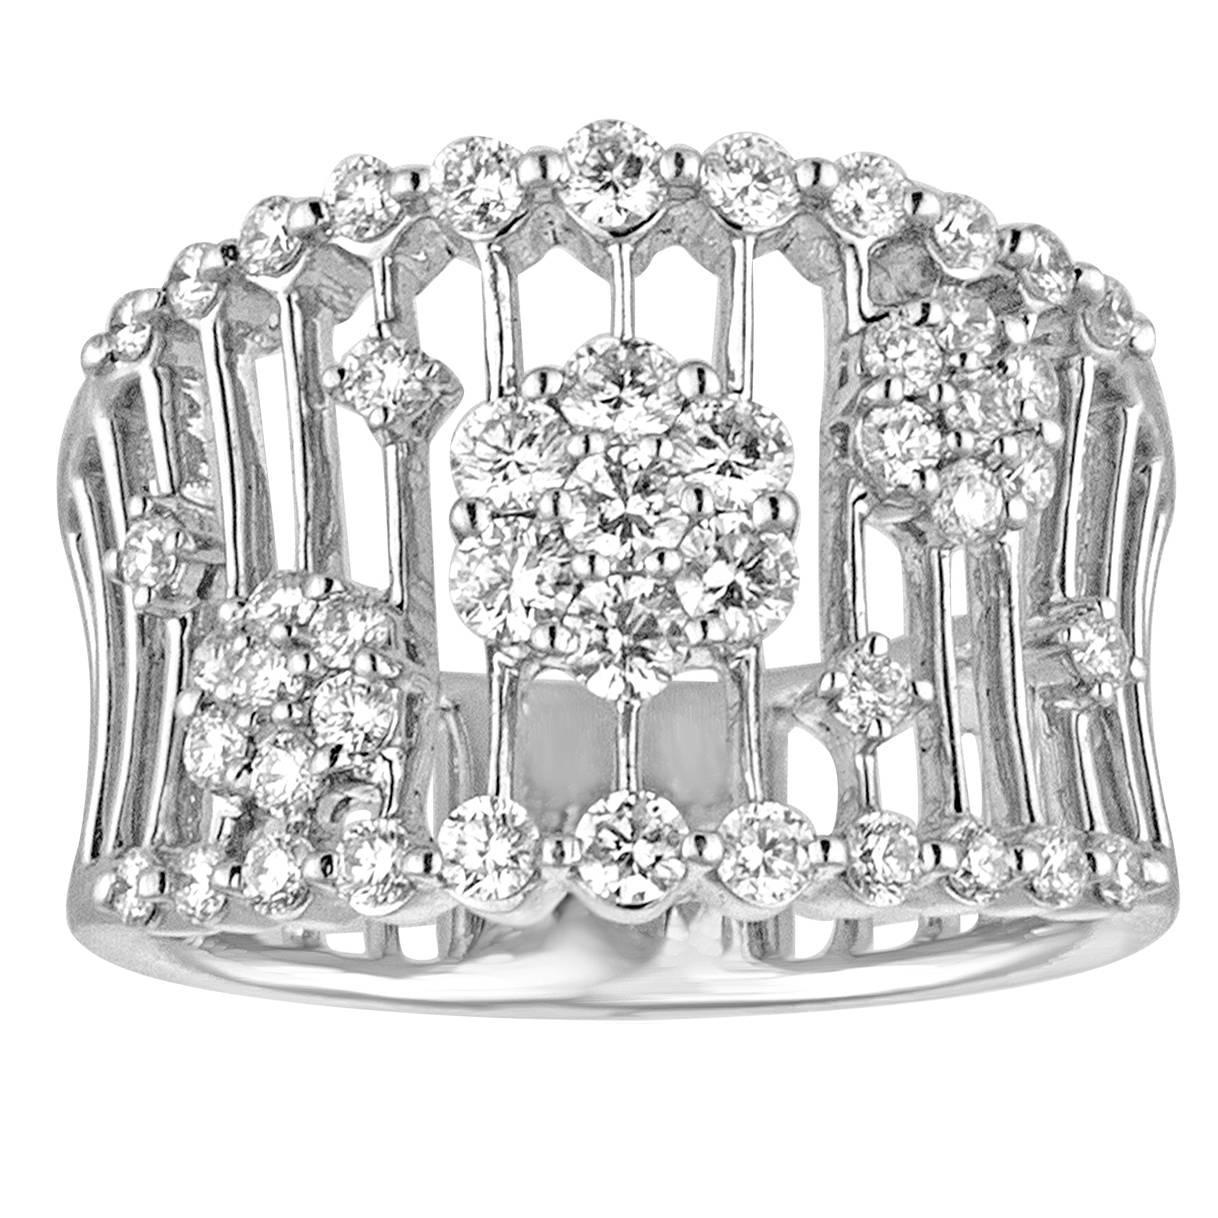 0.98 Carats Diamond Flowers on Bars Gold Ring